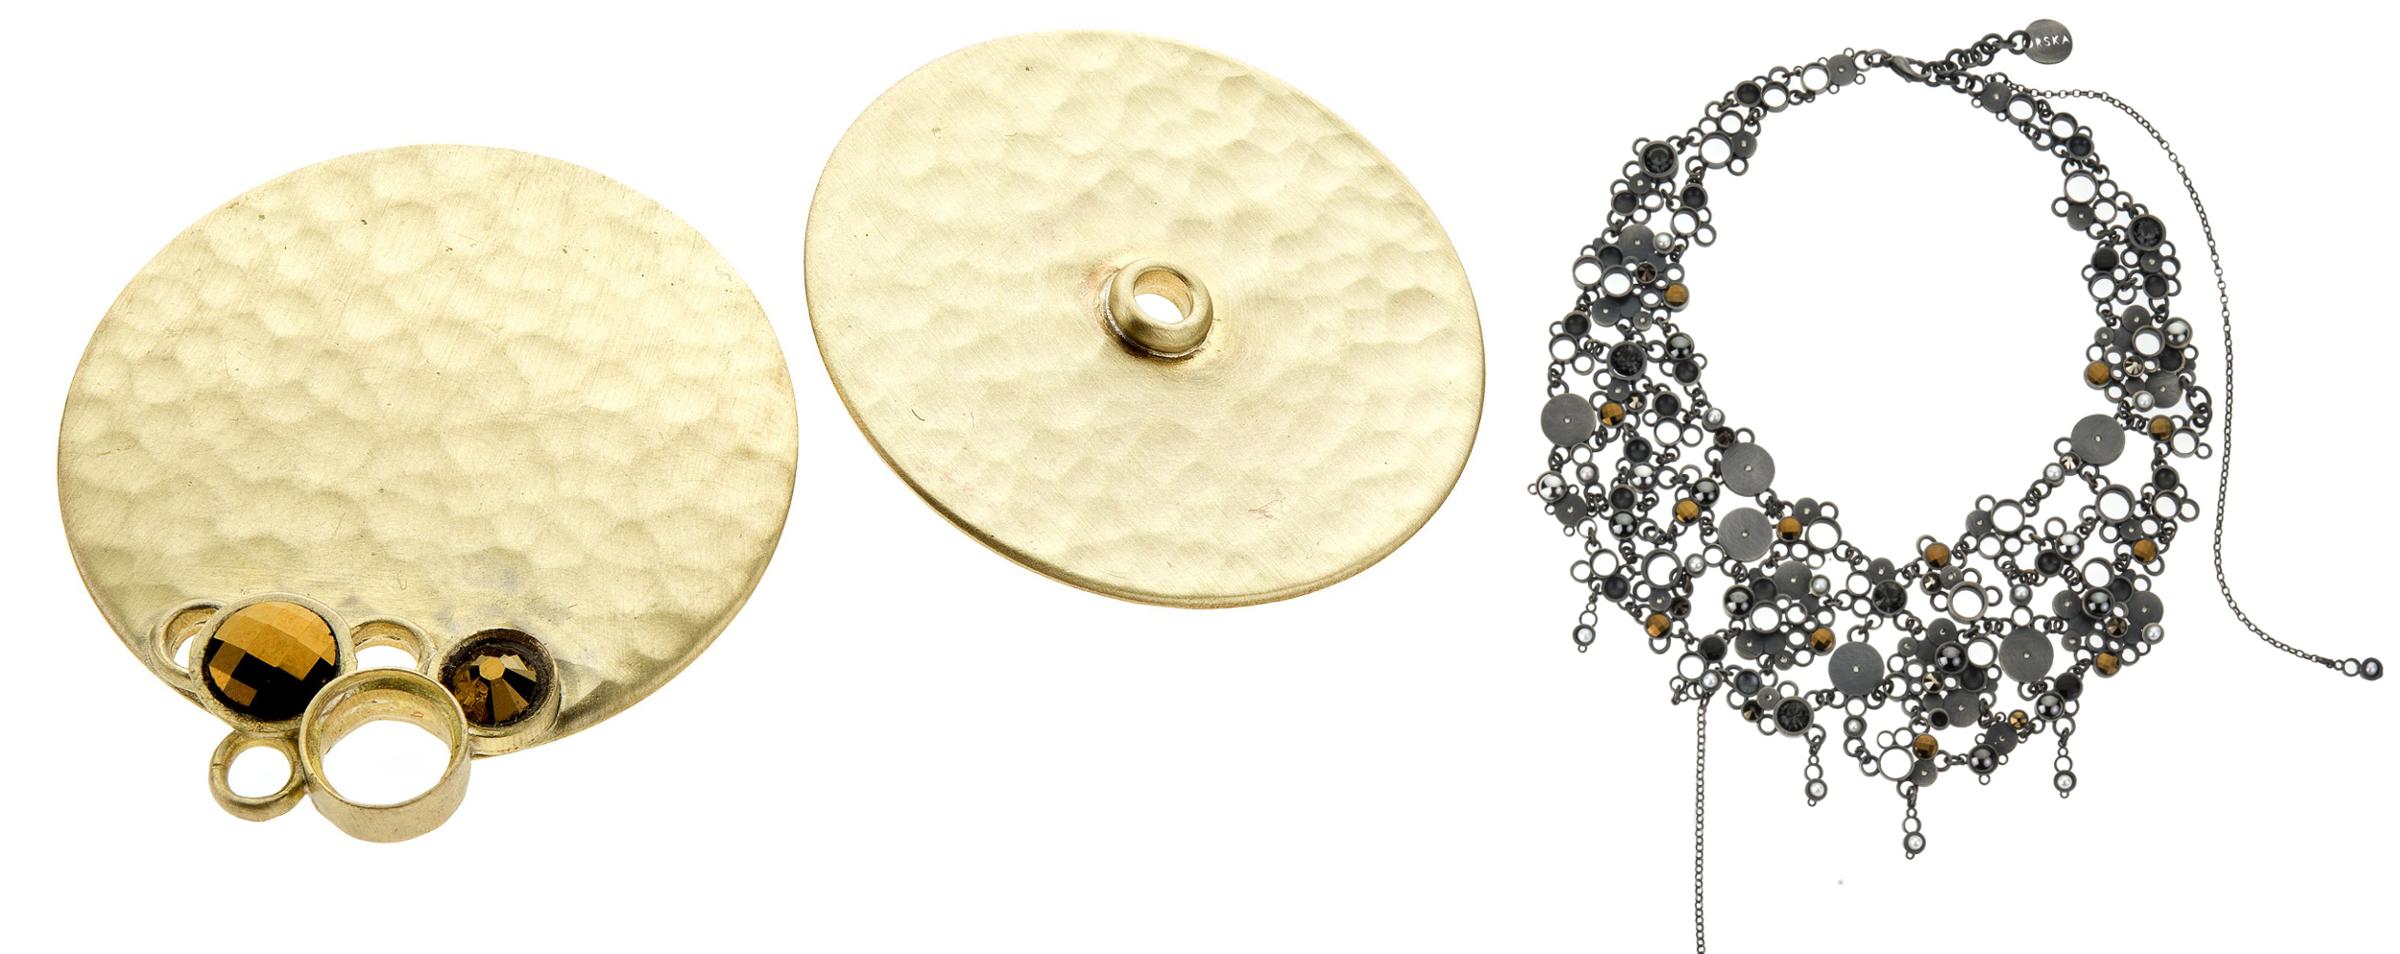 Orska (fot. materiały promocyjne)